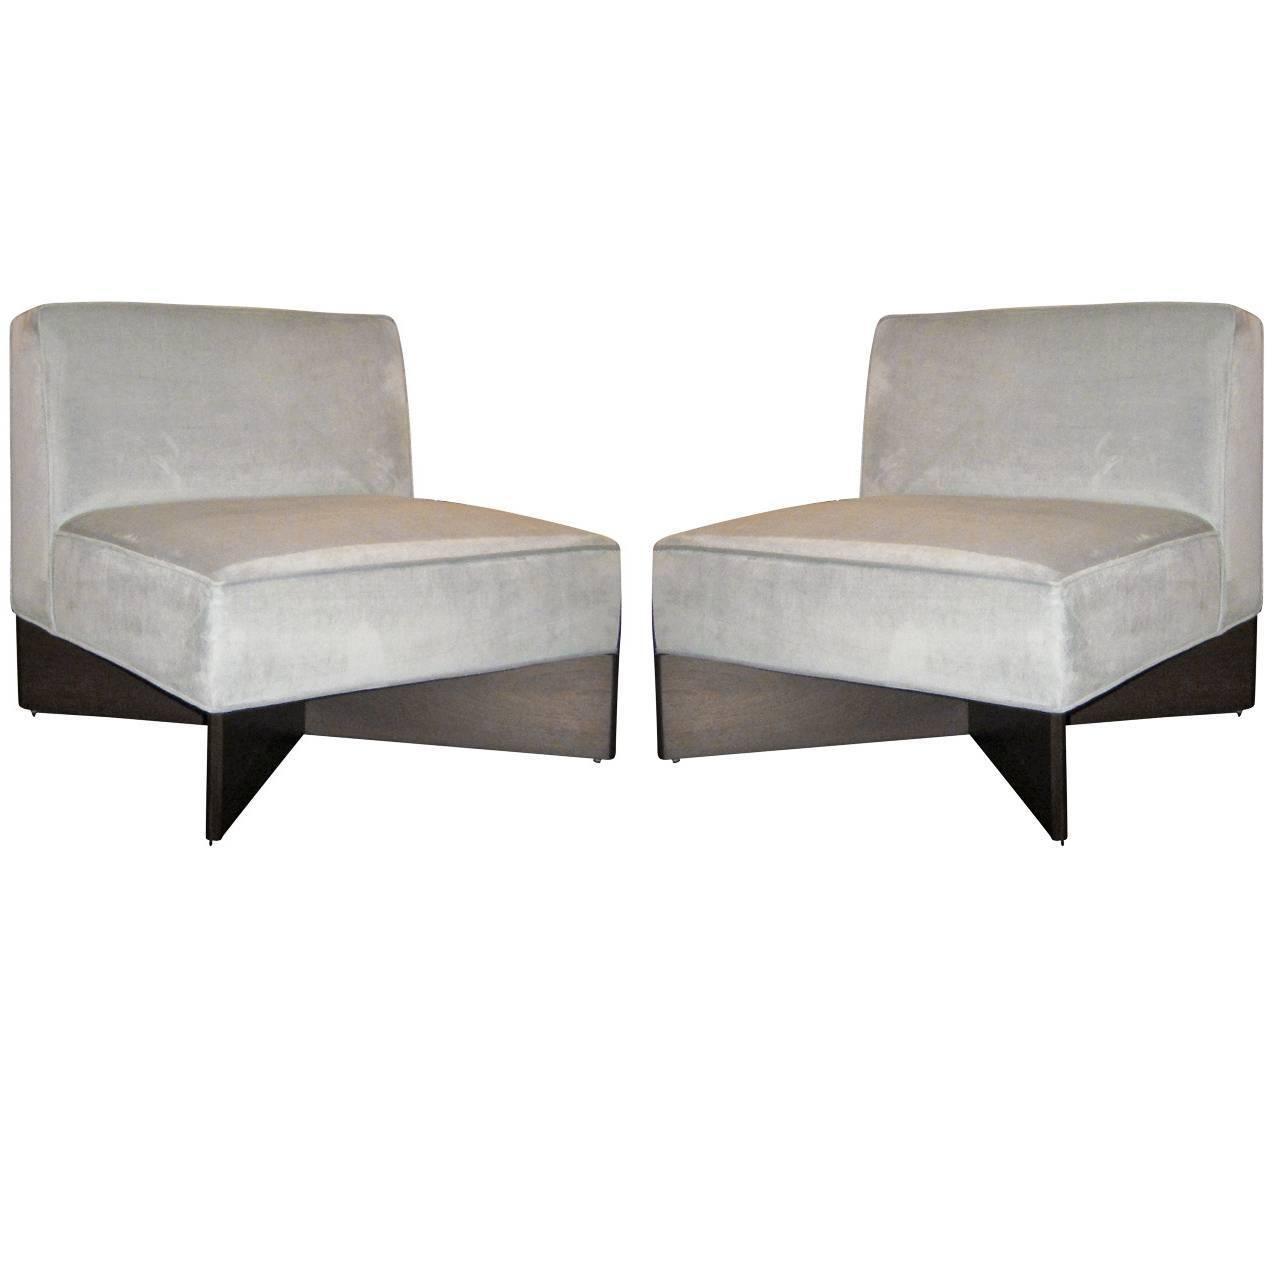 Fabulous Pair Of Pierre Guariche Slipper Chairs Chairs Slipper Theyellowbook Wood Chair Design Ideas Theyellowbookinfo